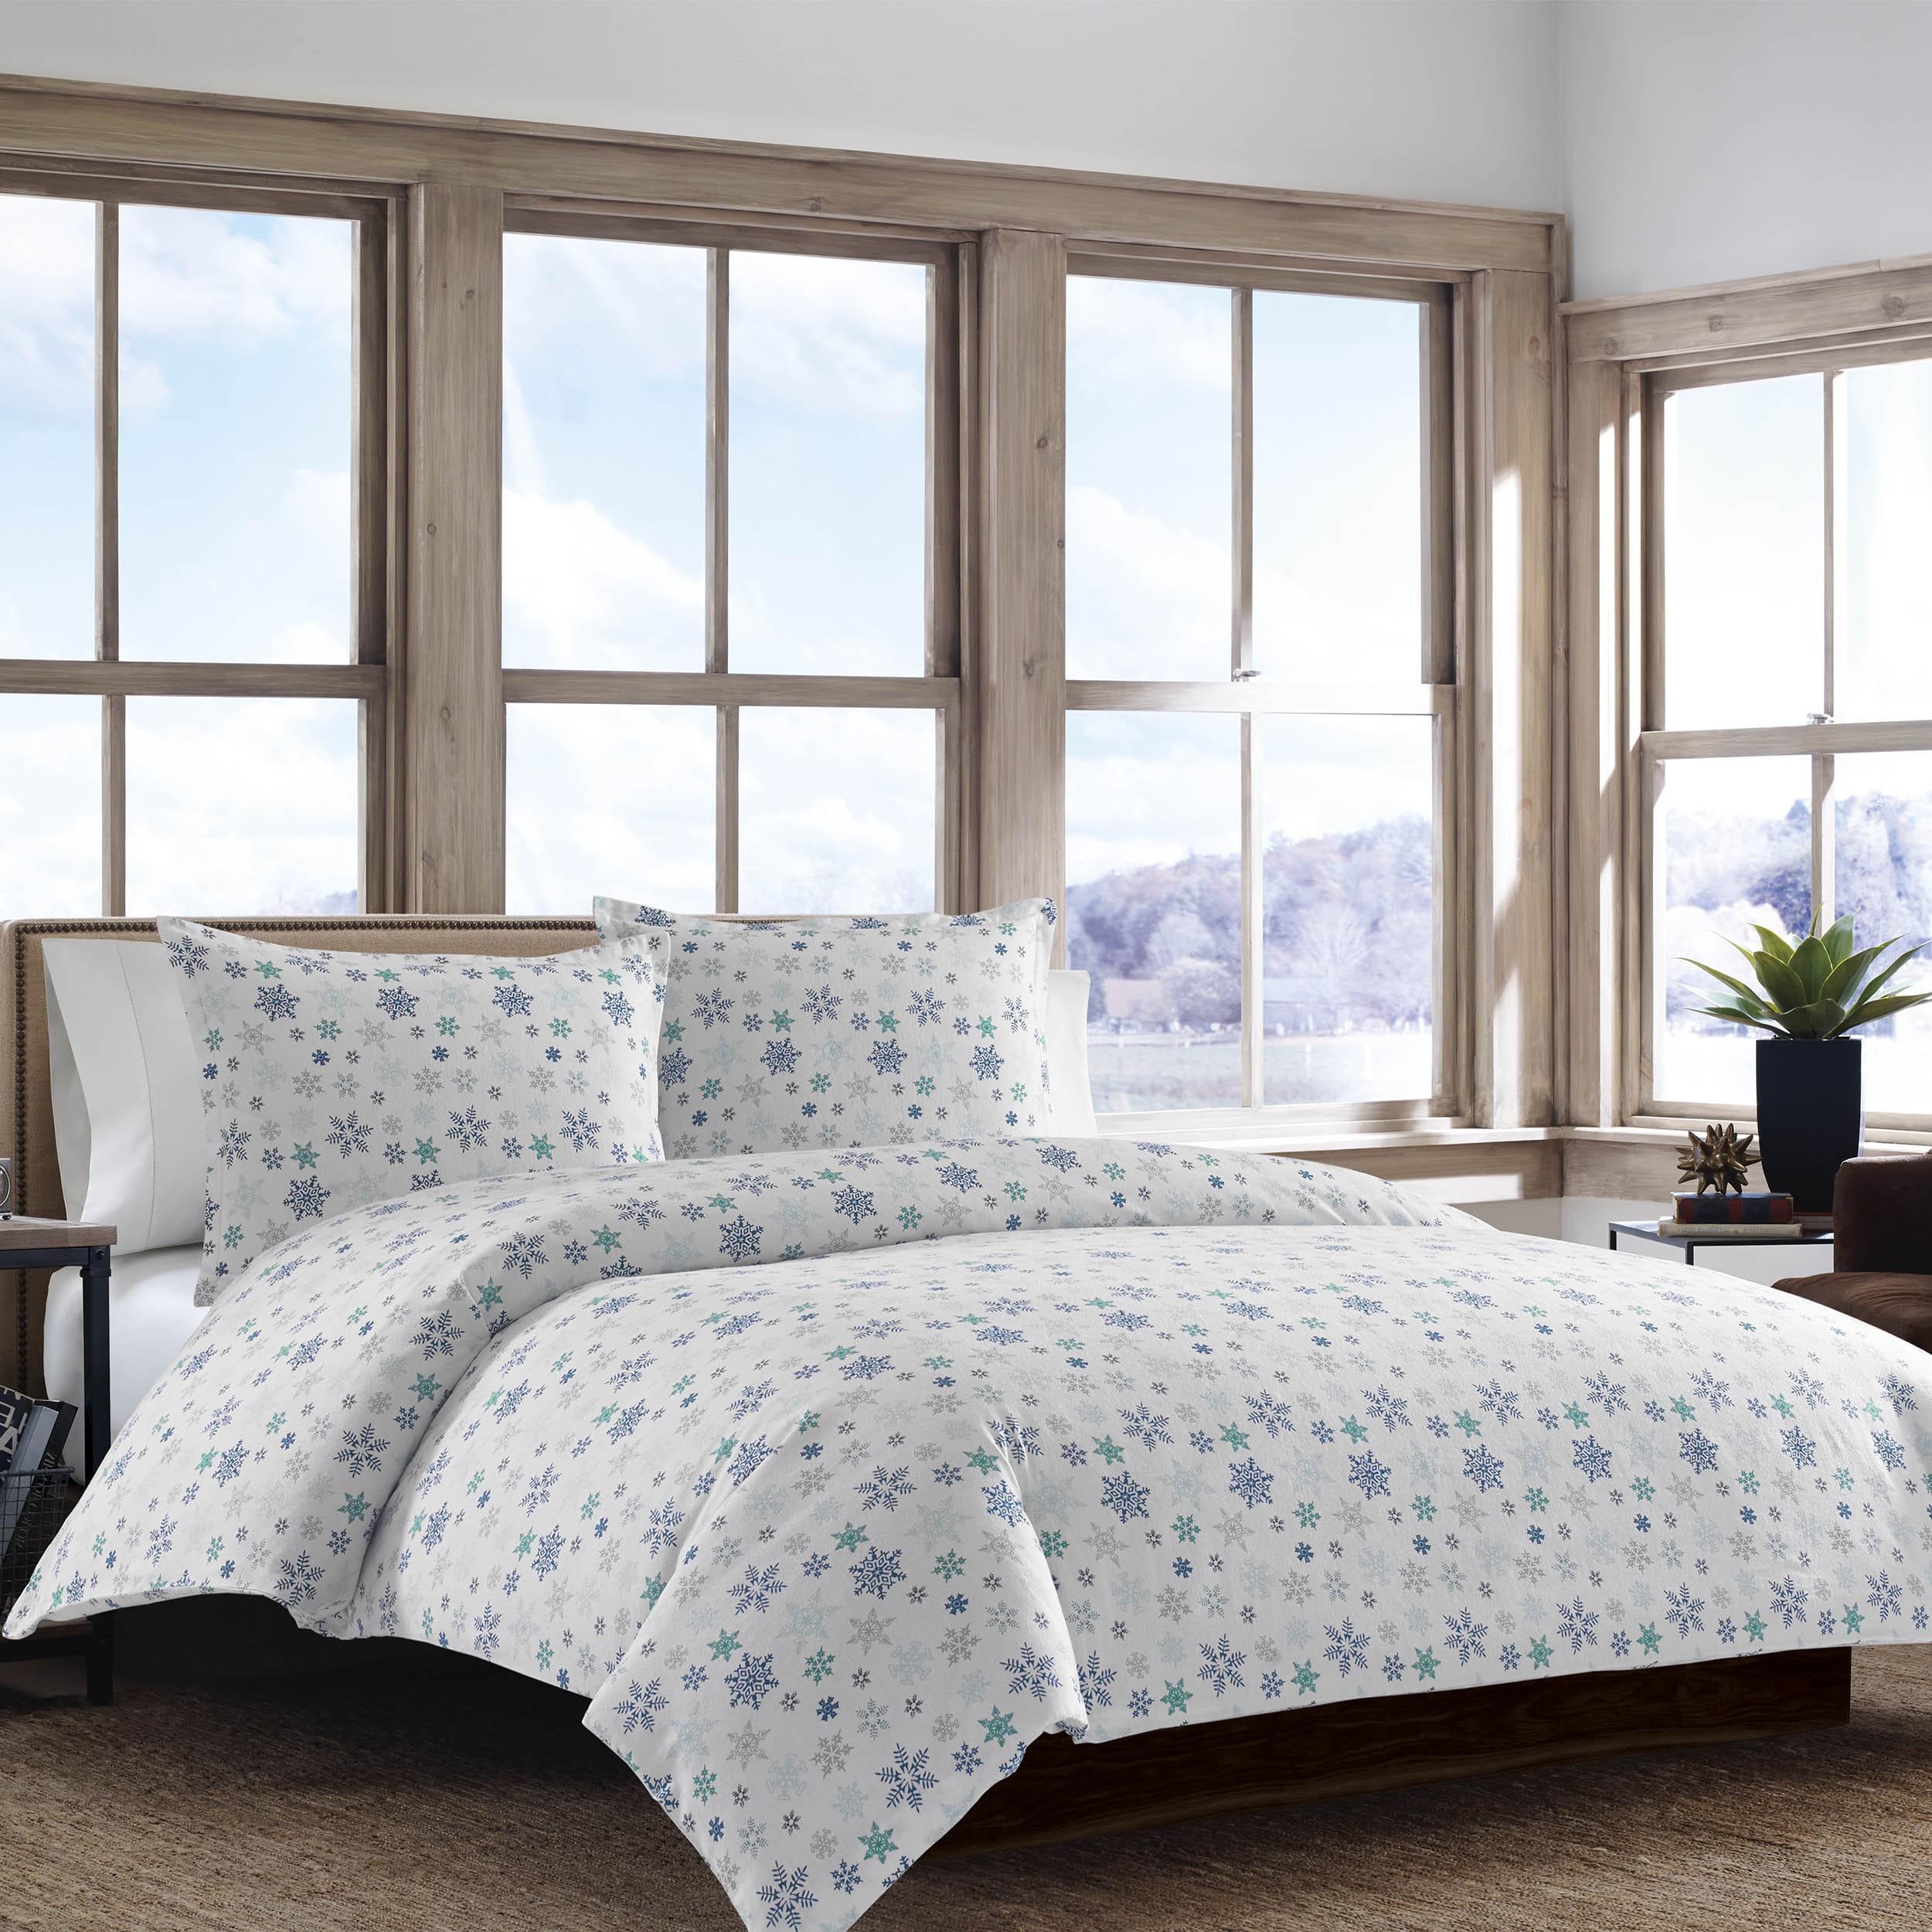 eddie bedding today bath product piece fidalgo bed bauer comforter down alt shipping free set overstock